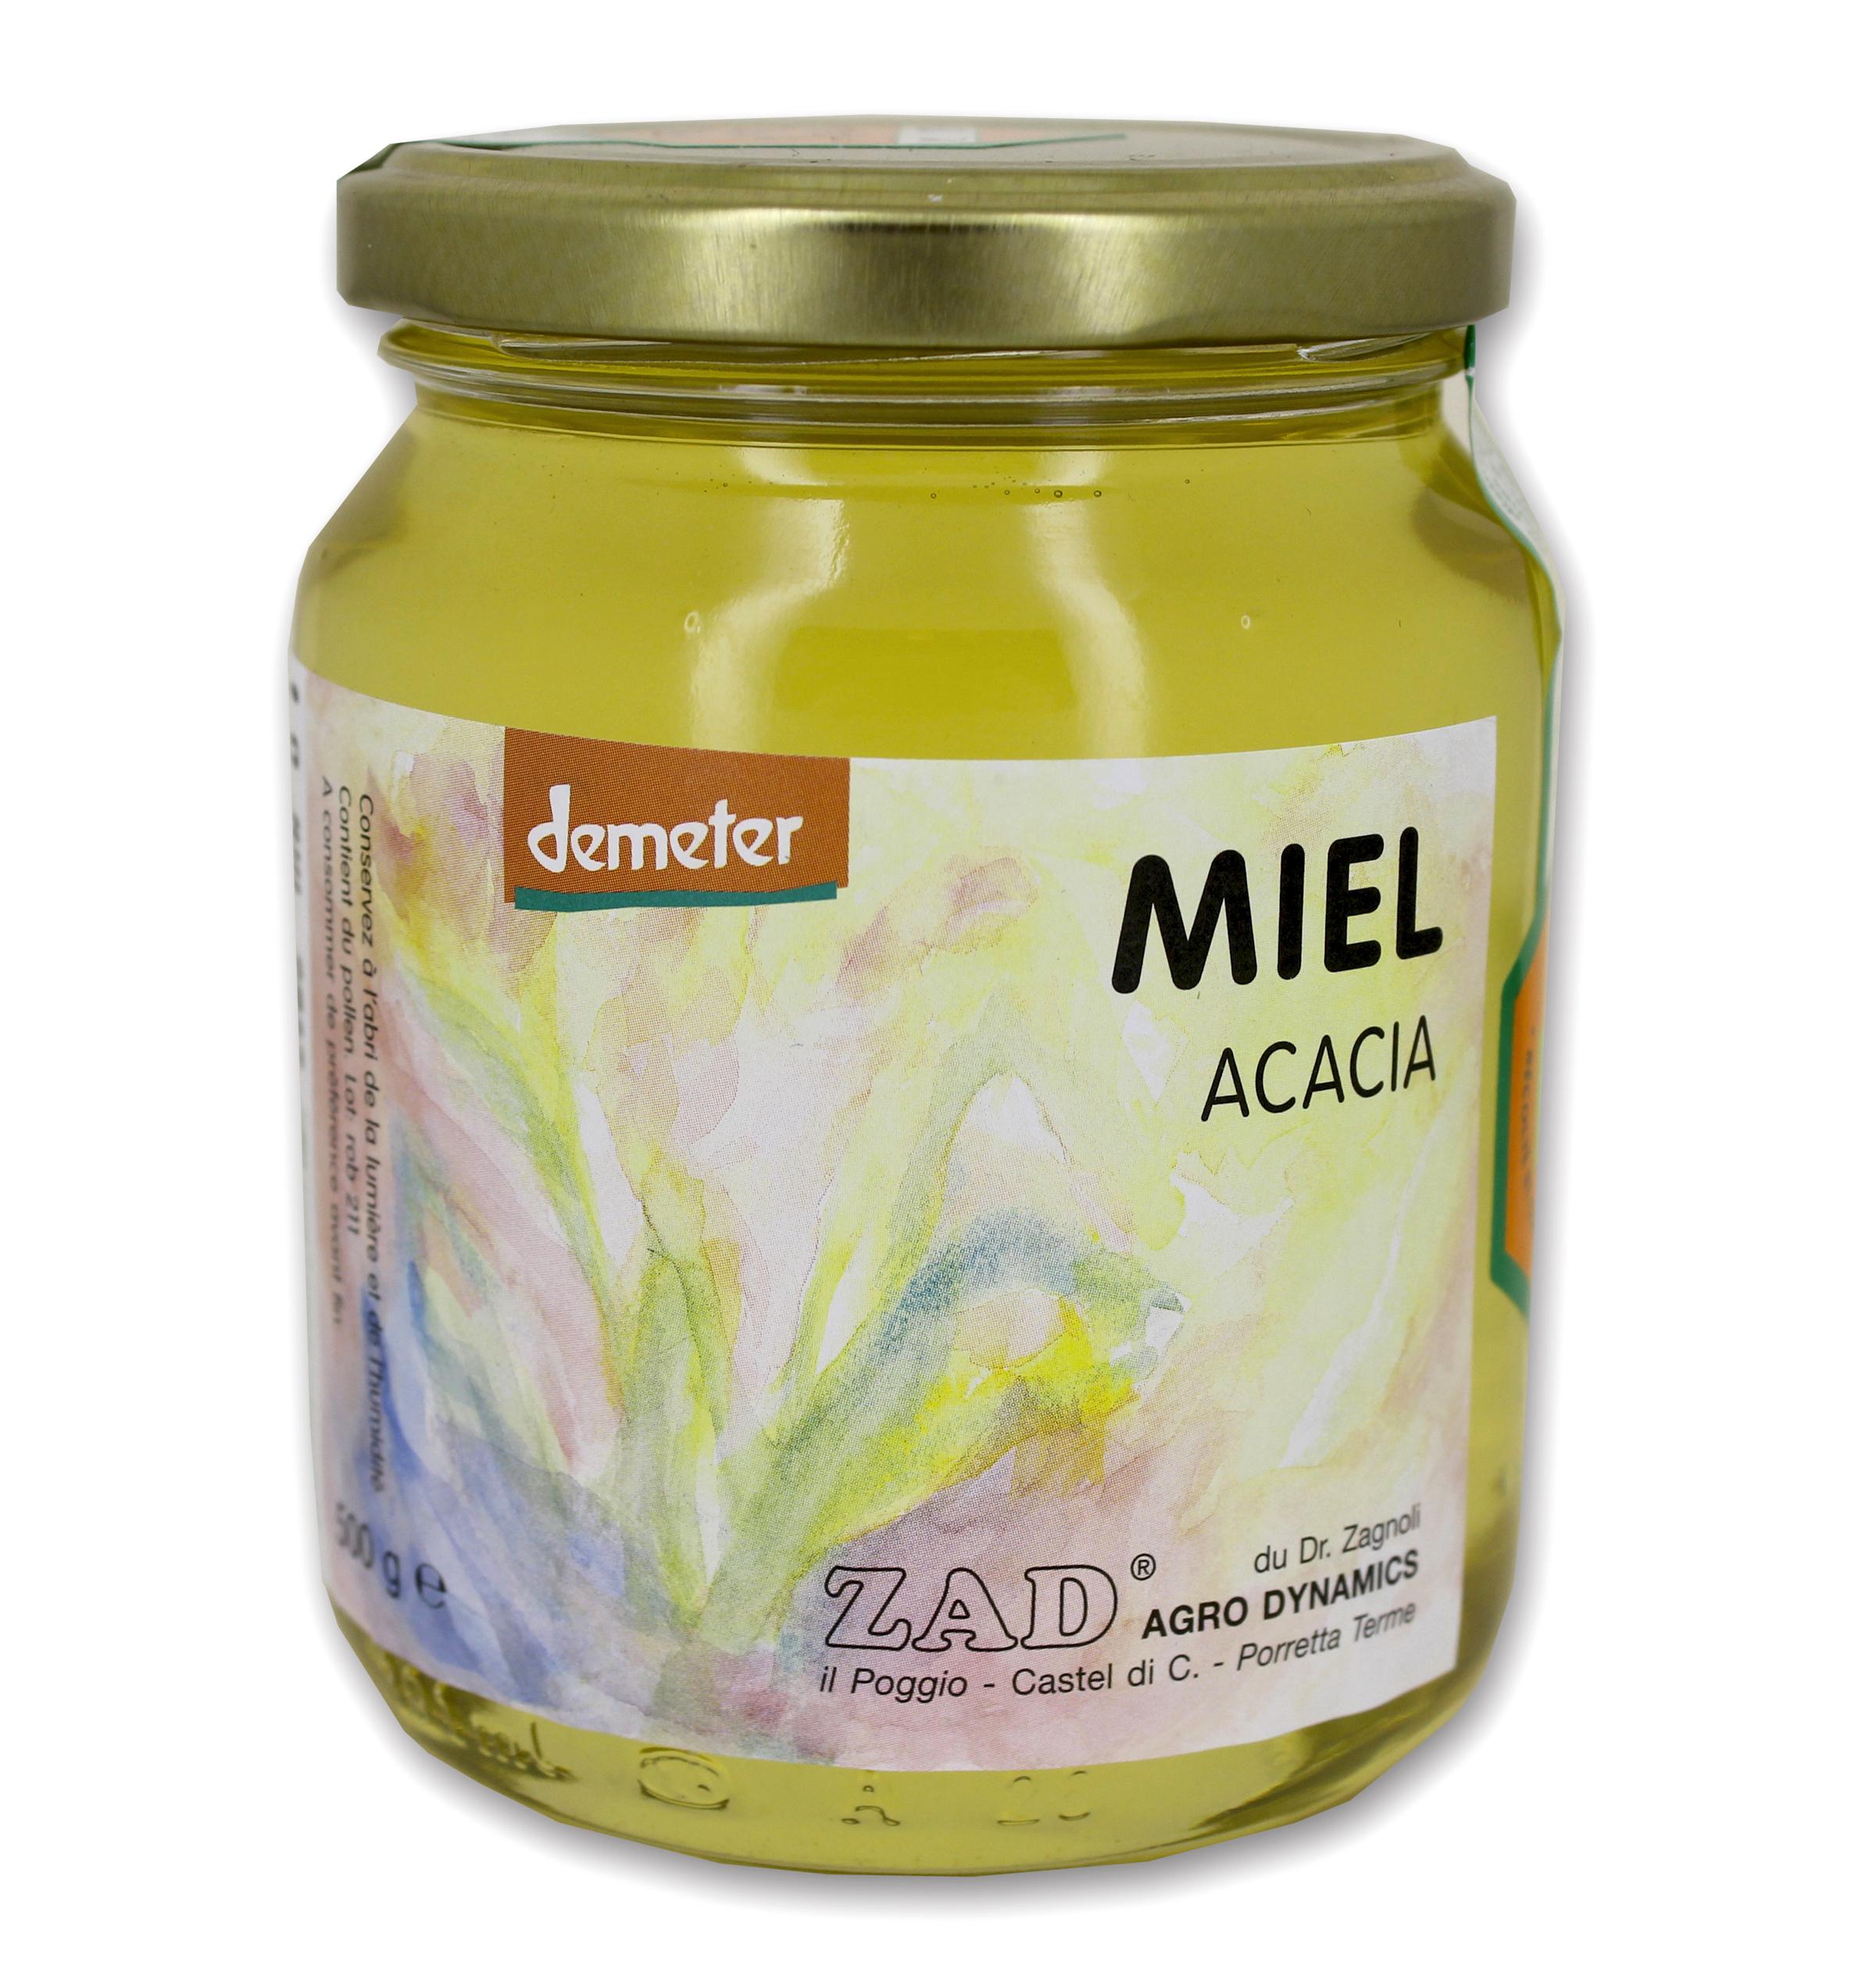 Miel d'acacia BIO Zad Agrodynamics Biodynamie (500 g)